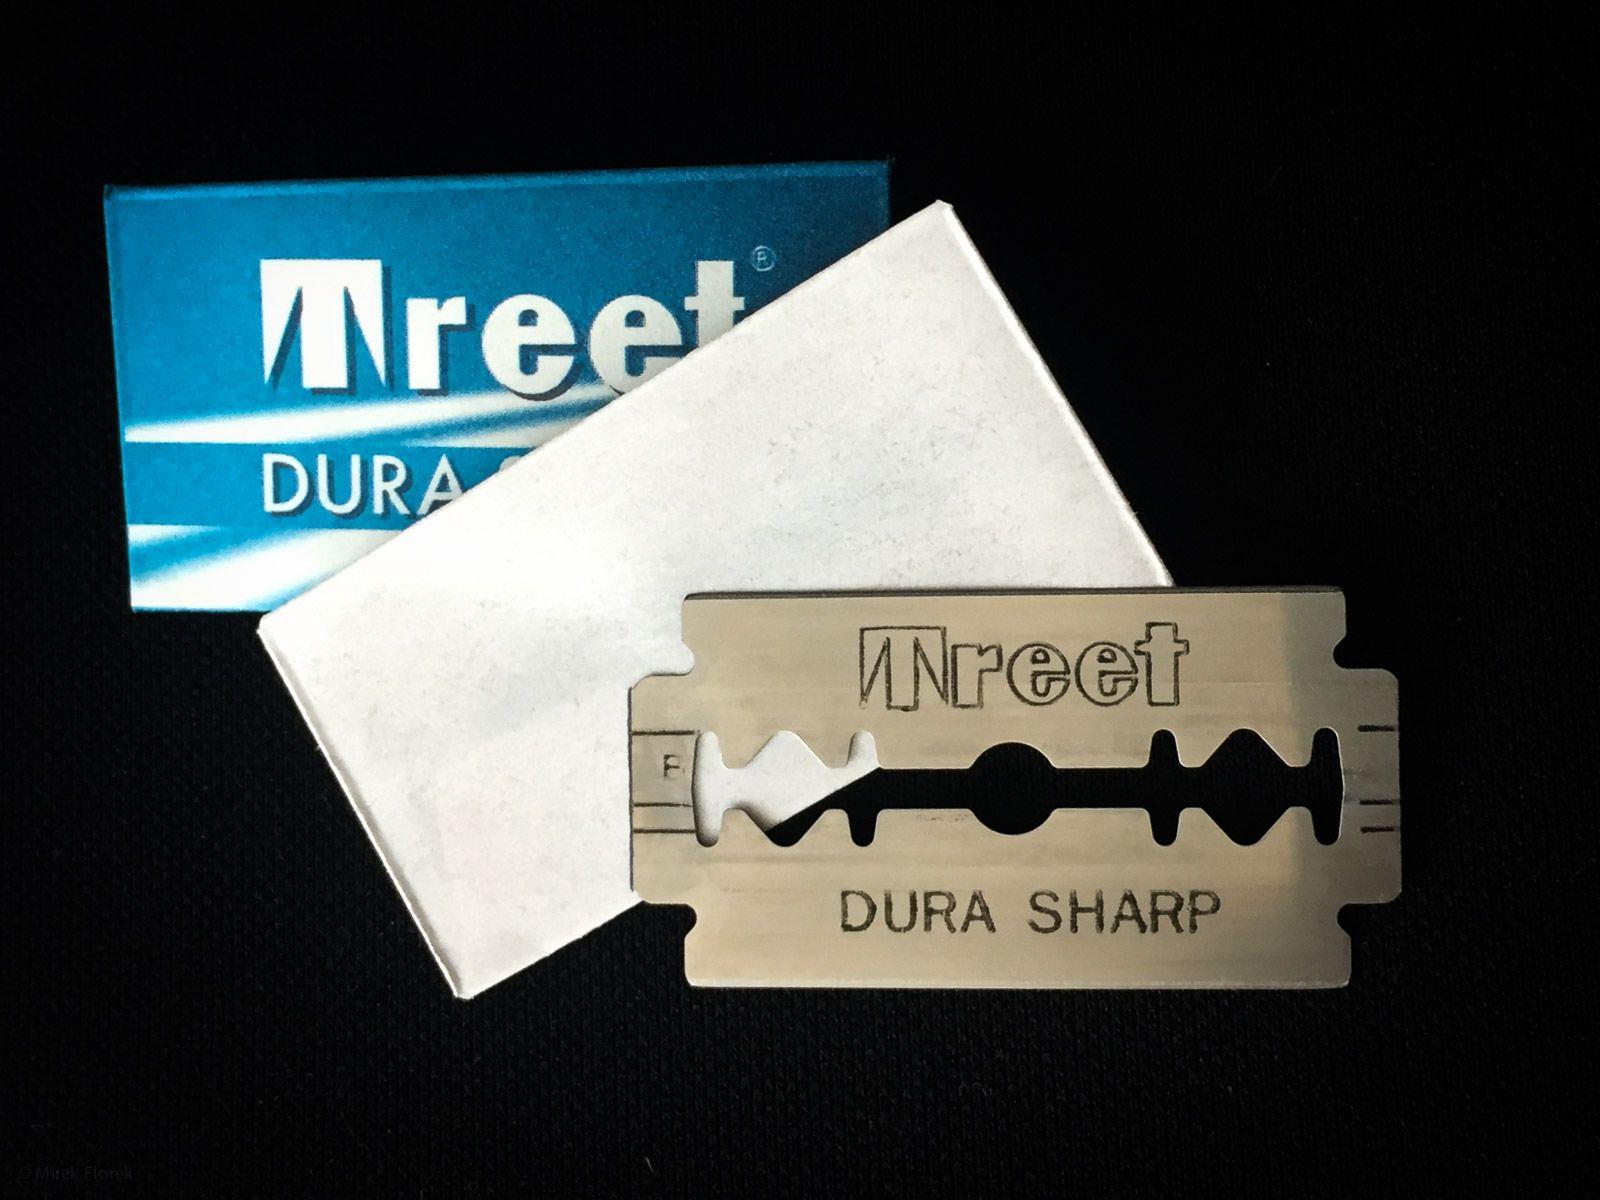 Żyletka Treet Dura Sharp